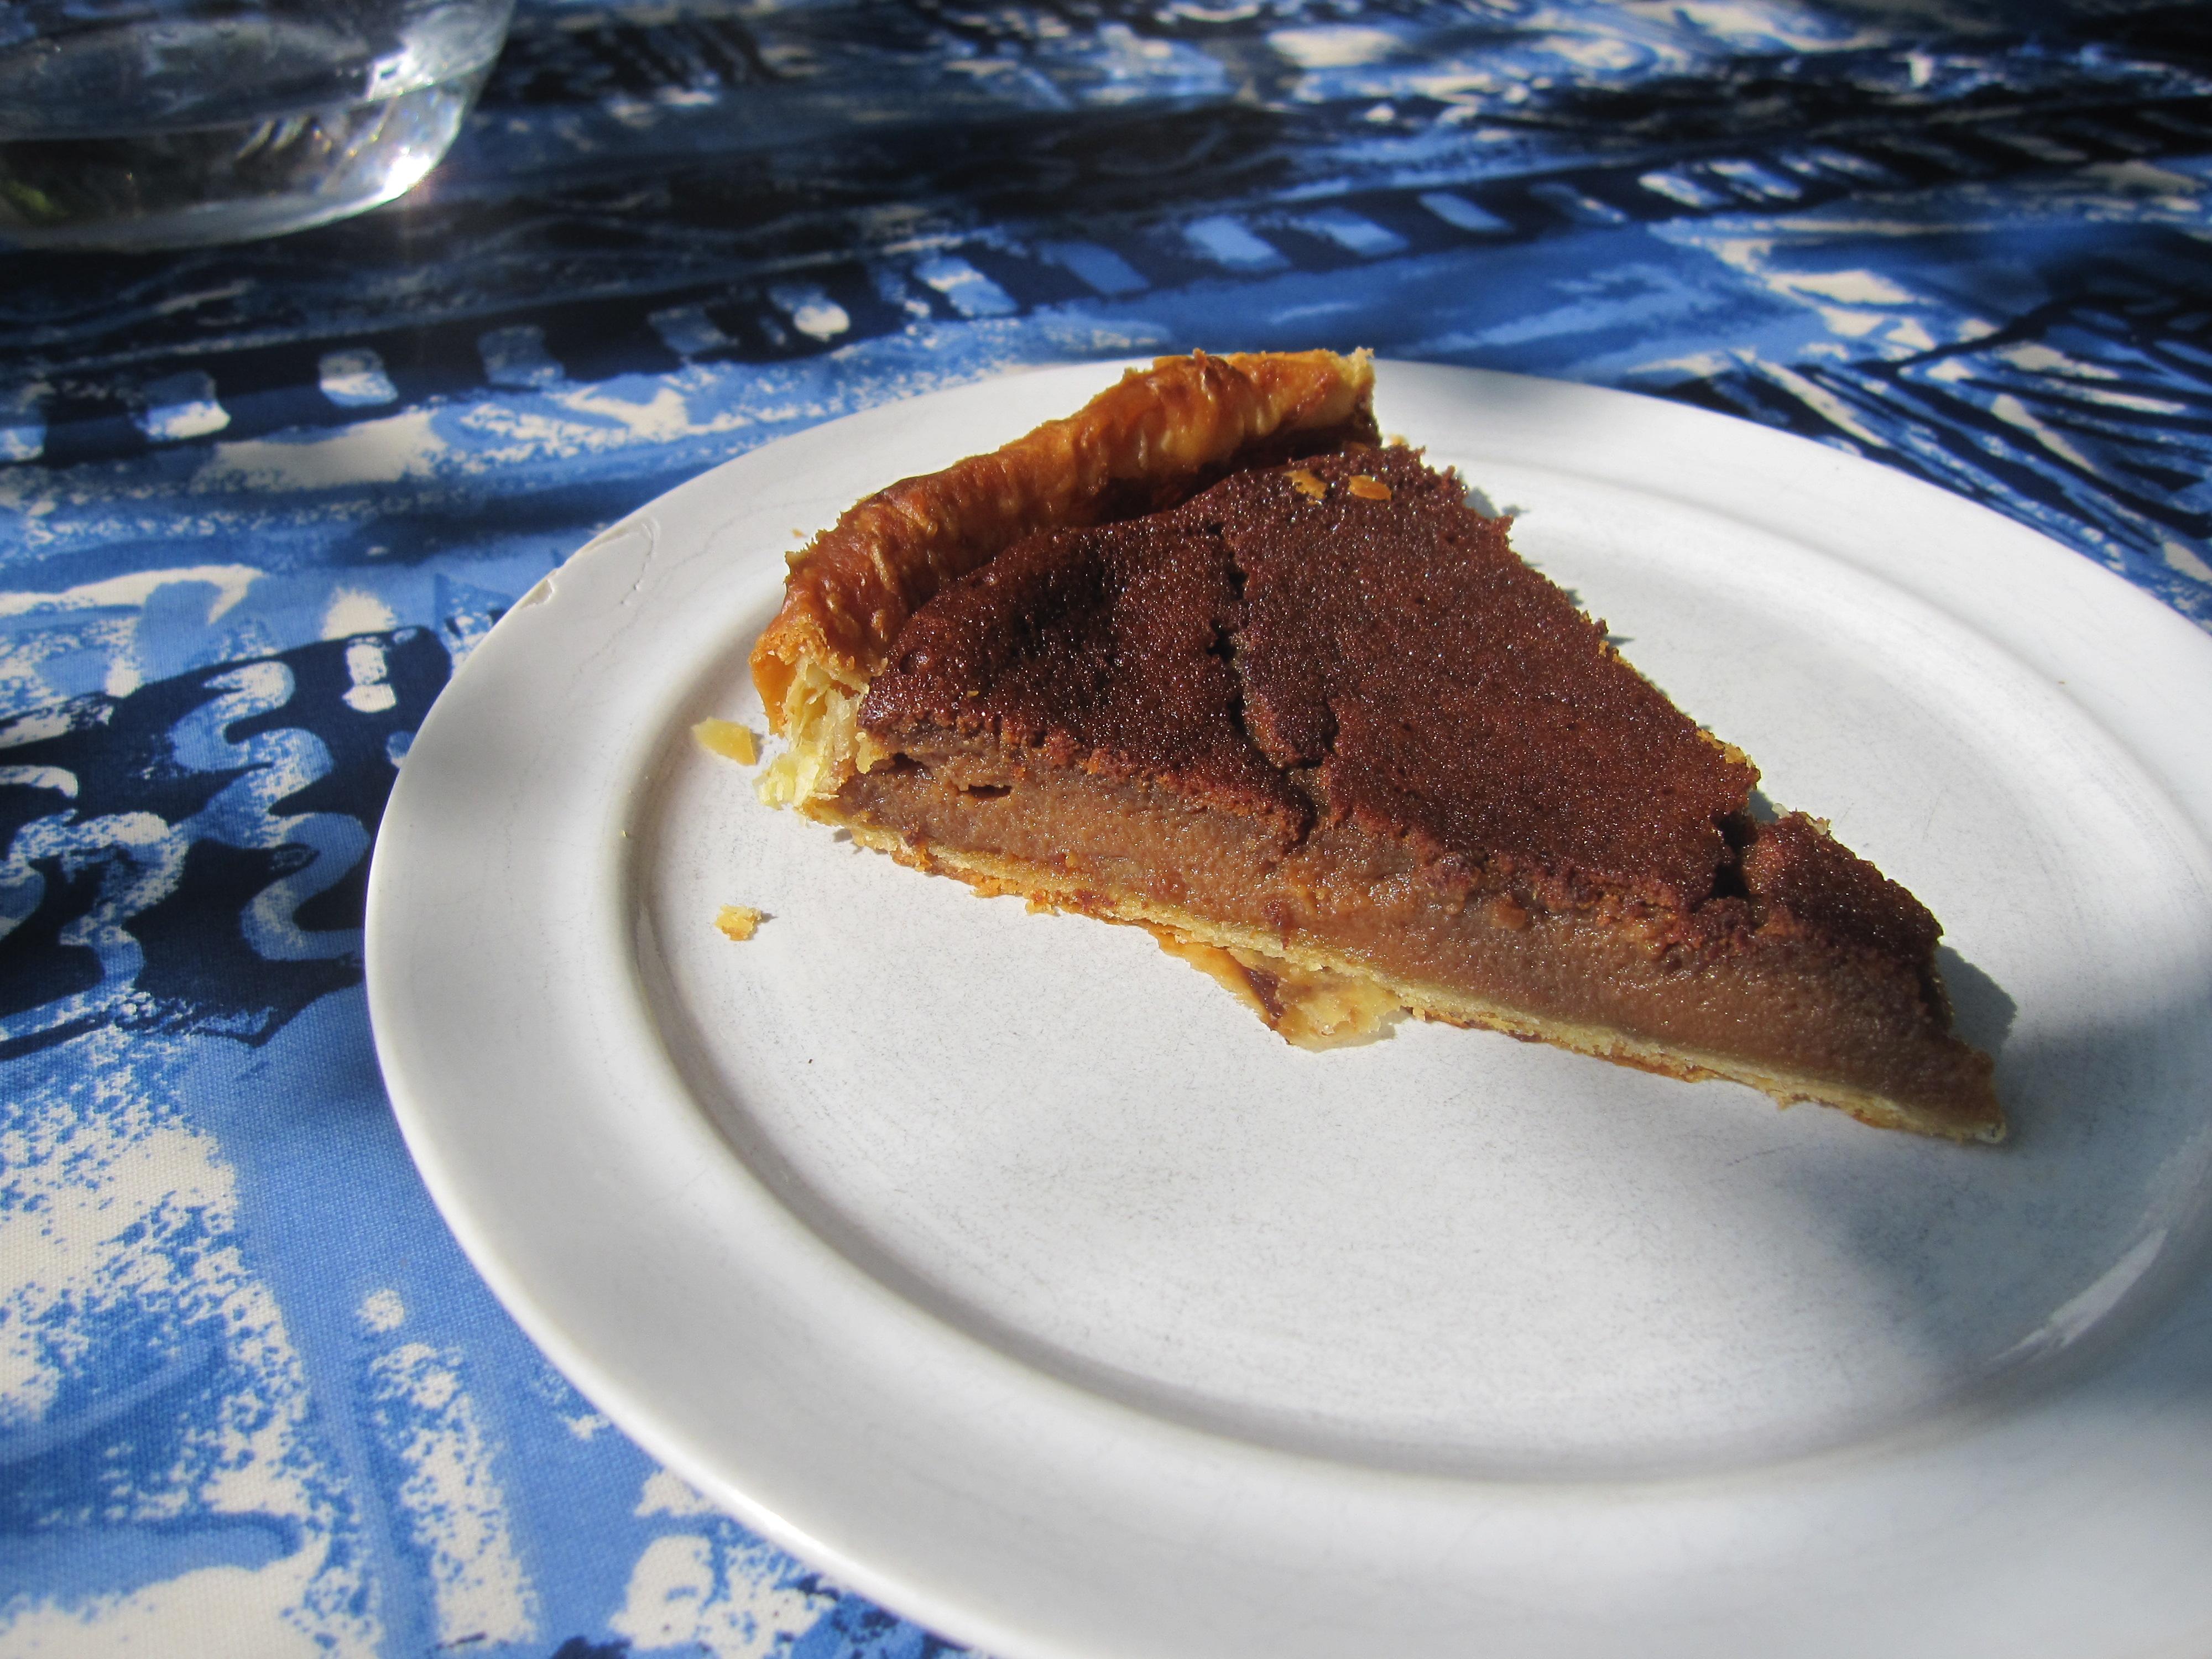 file:tarte au vin cuit - wikimedia commons